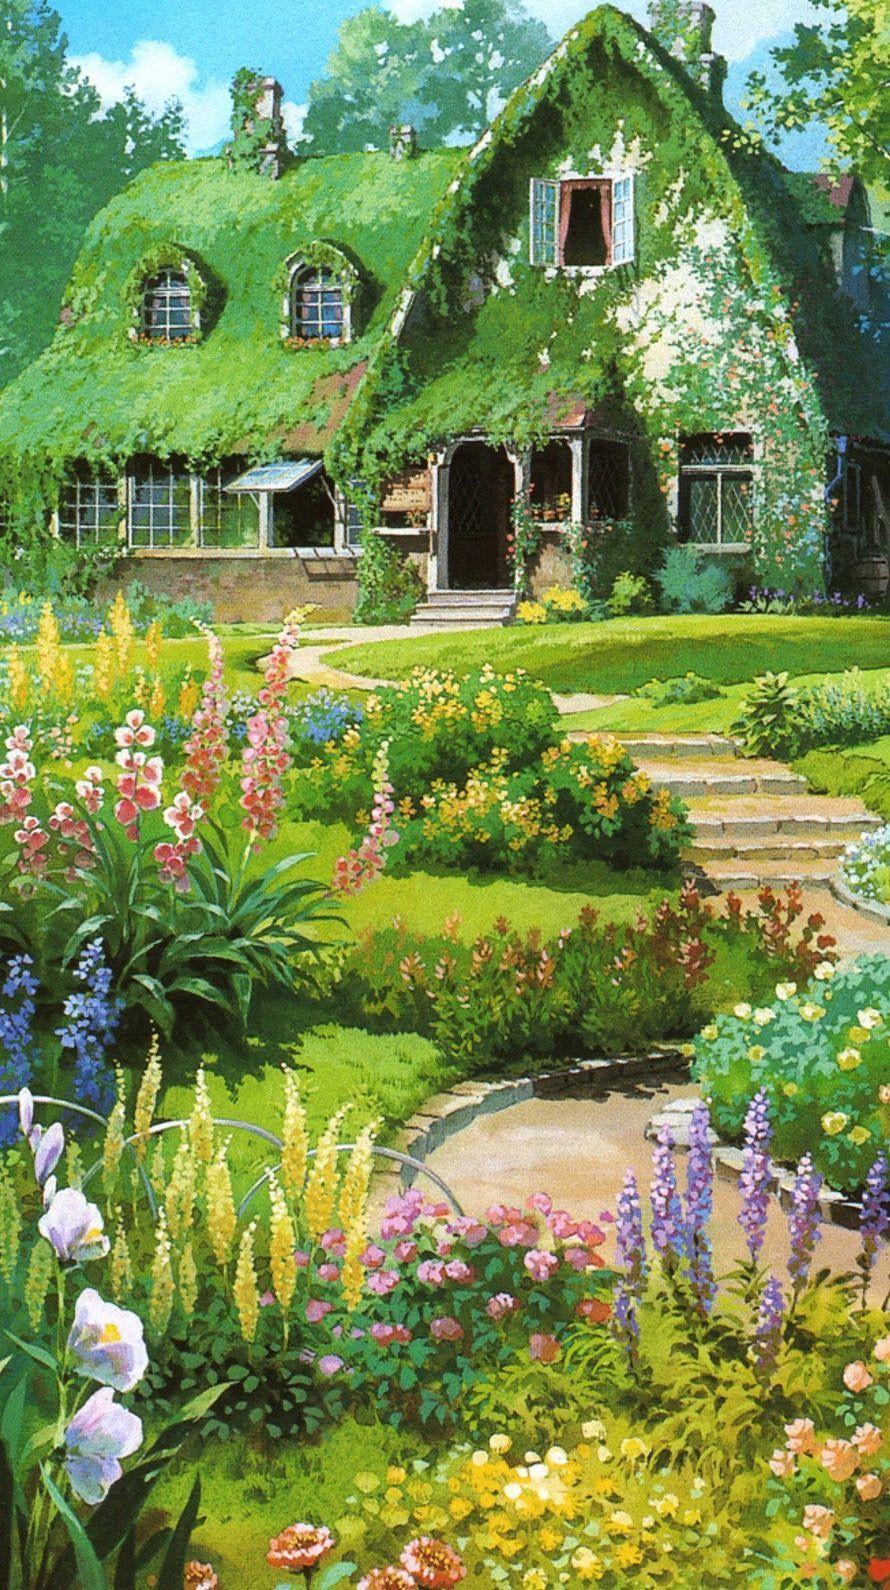 Maison Couverte De Plantes Et Jardin Fleuri Animesc Anime